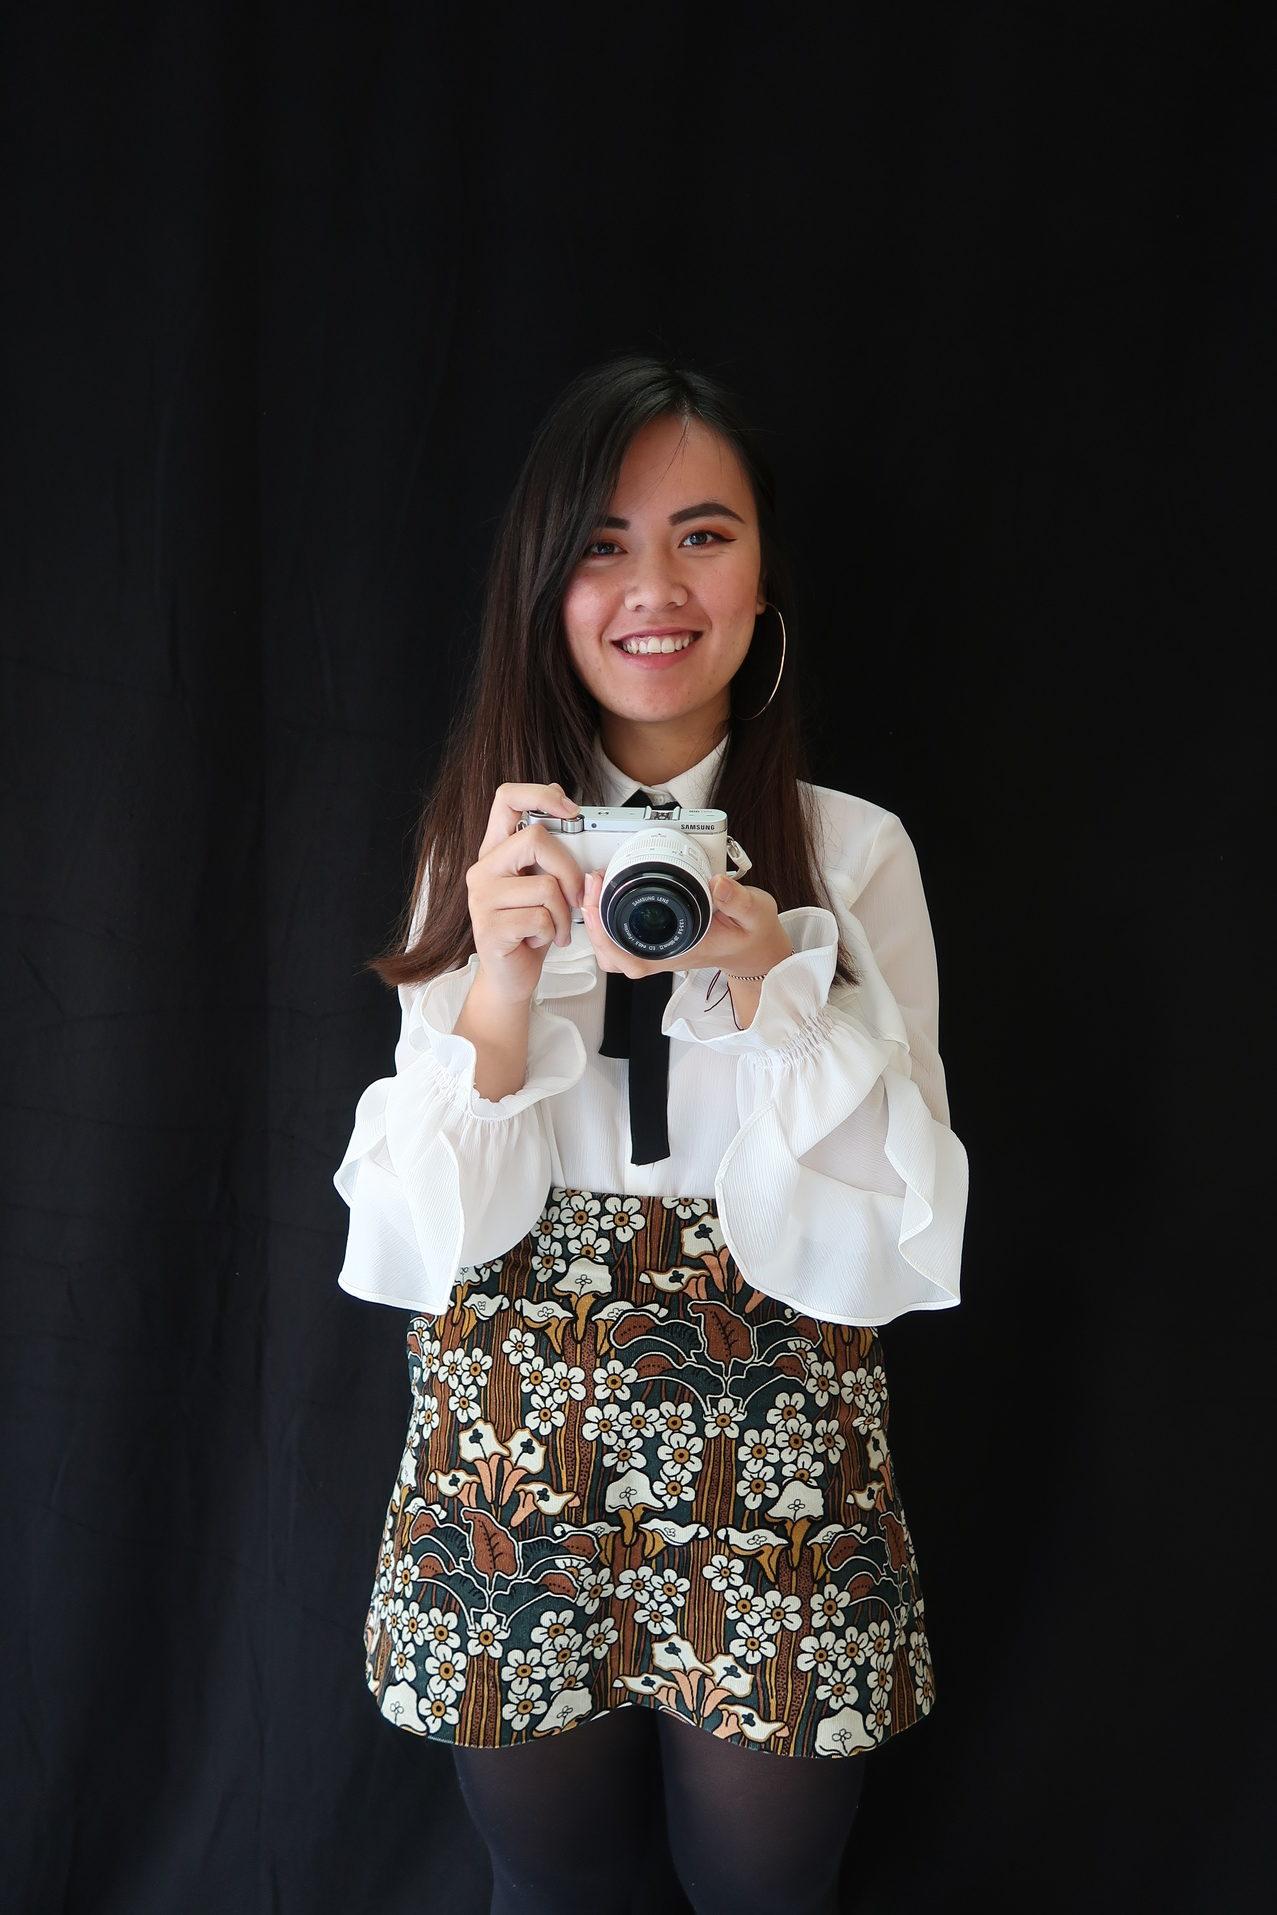 Quynh Trang Duong